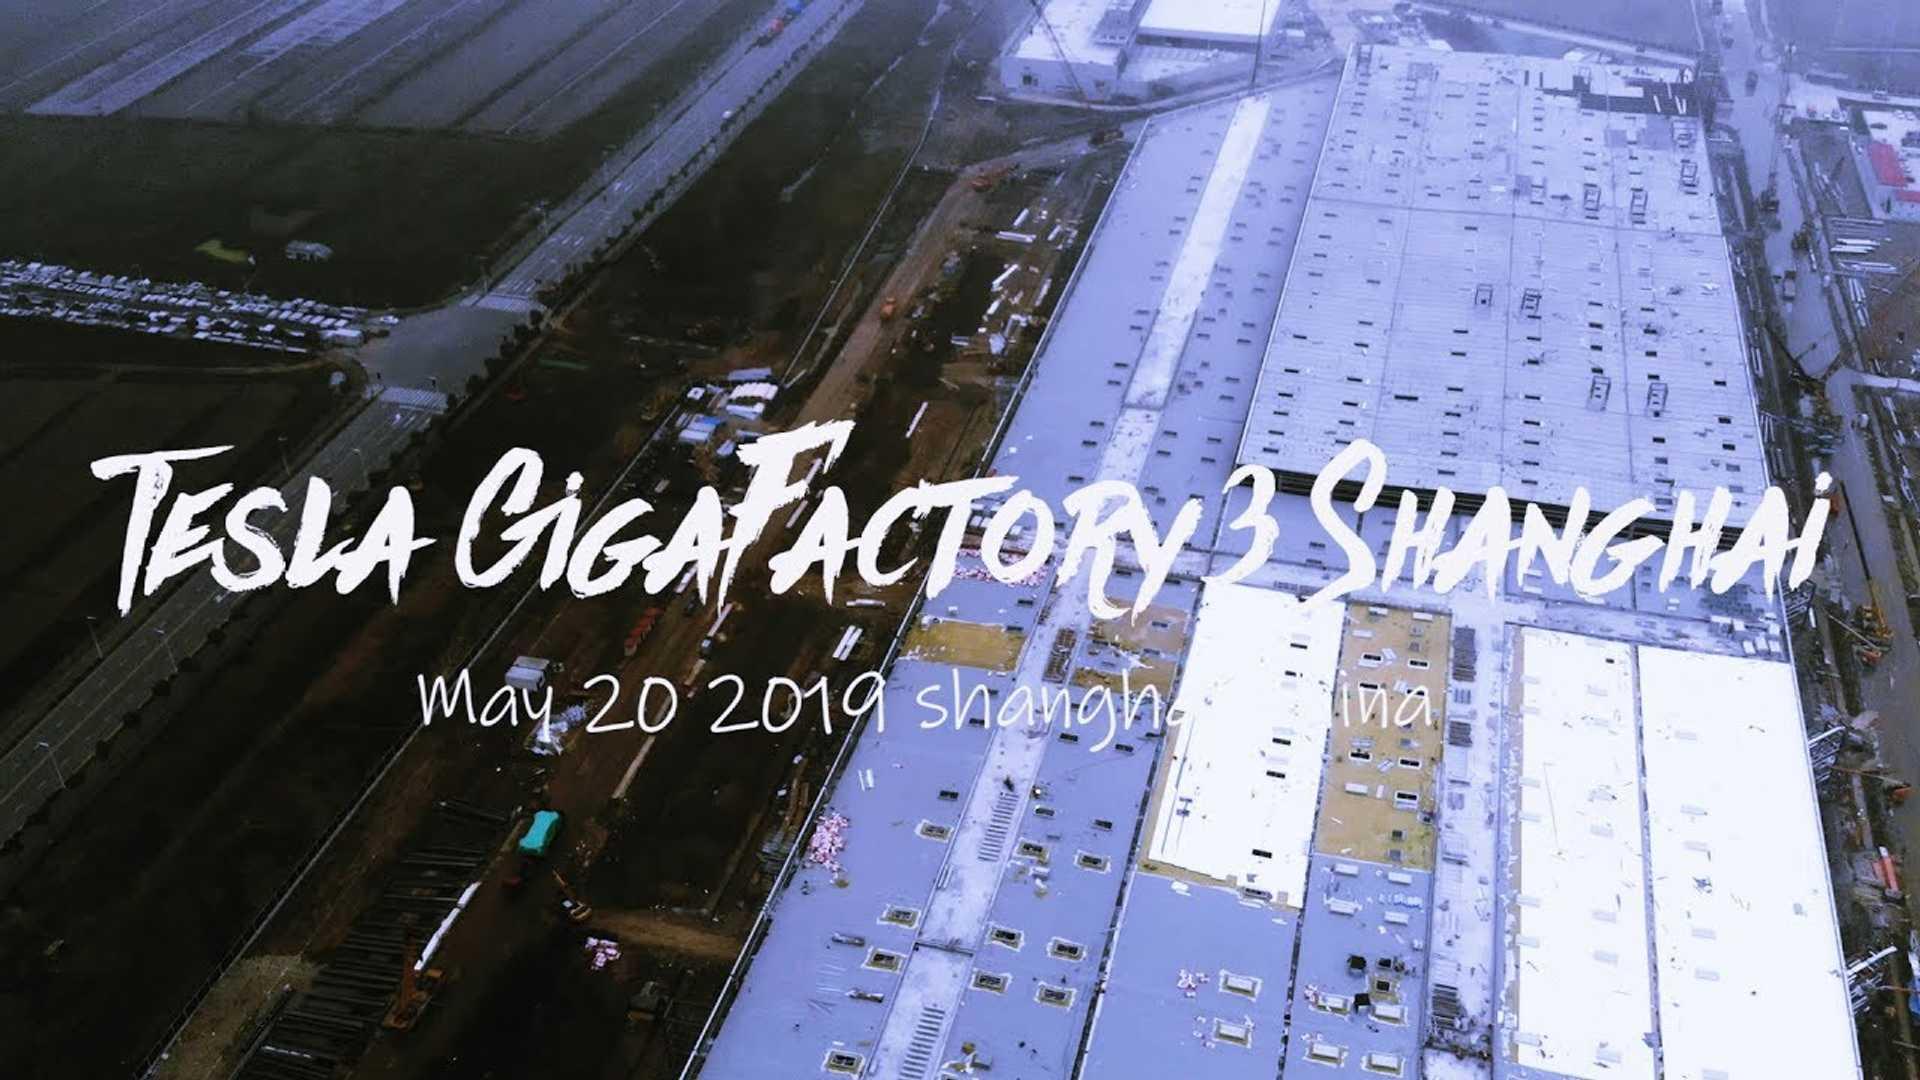 Tesla Gigafactory 3 Construction Progress May 20, 2019: Video